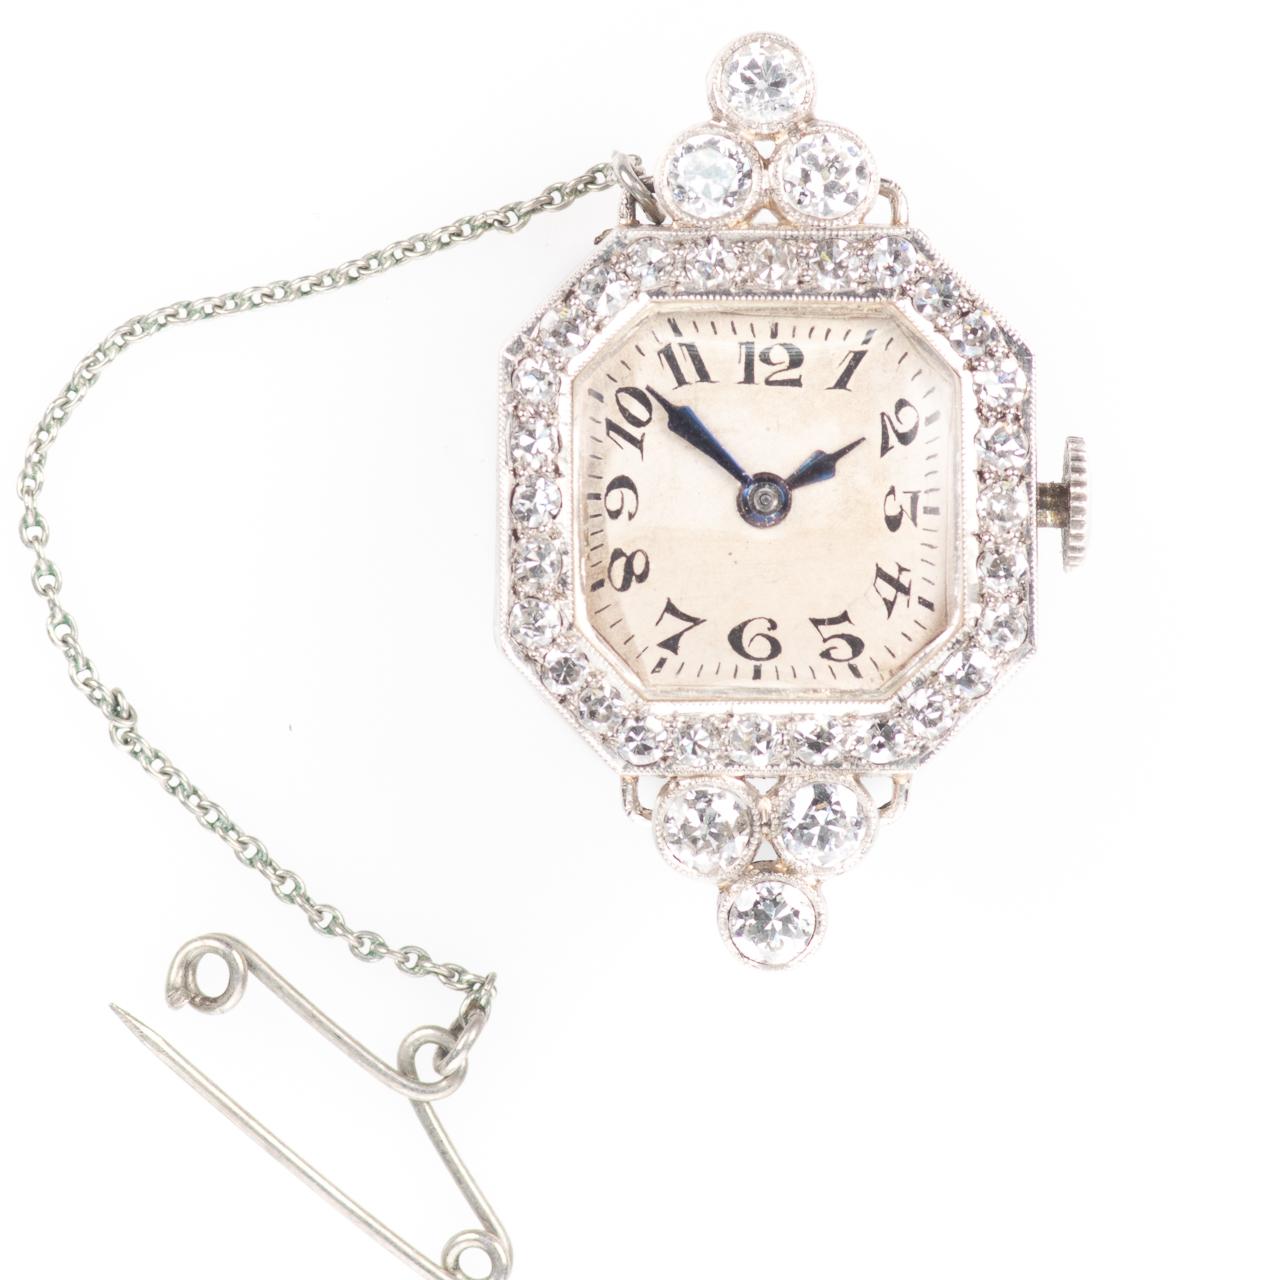 Platinum Art Deco 0.90ct Diamond Watch Brooch - Image 2 of 6